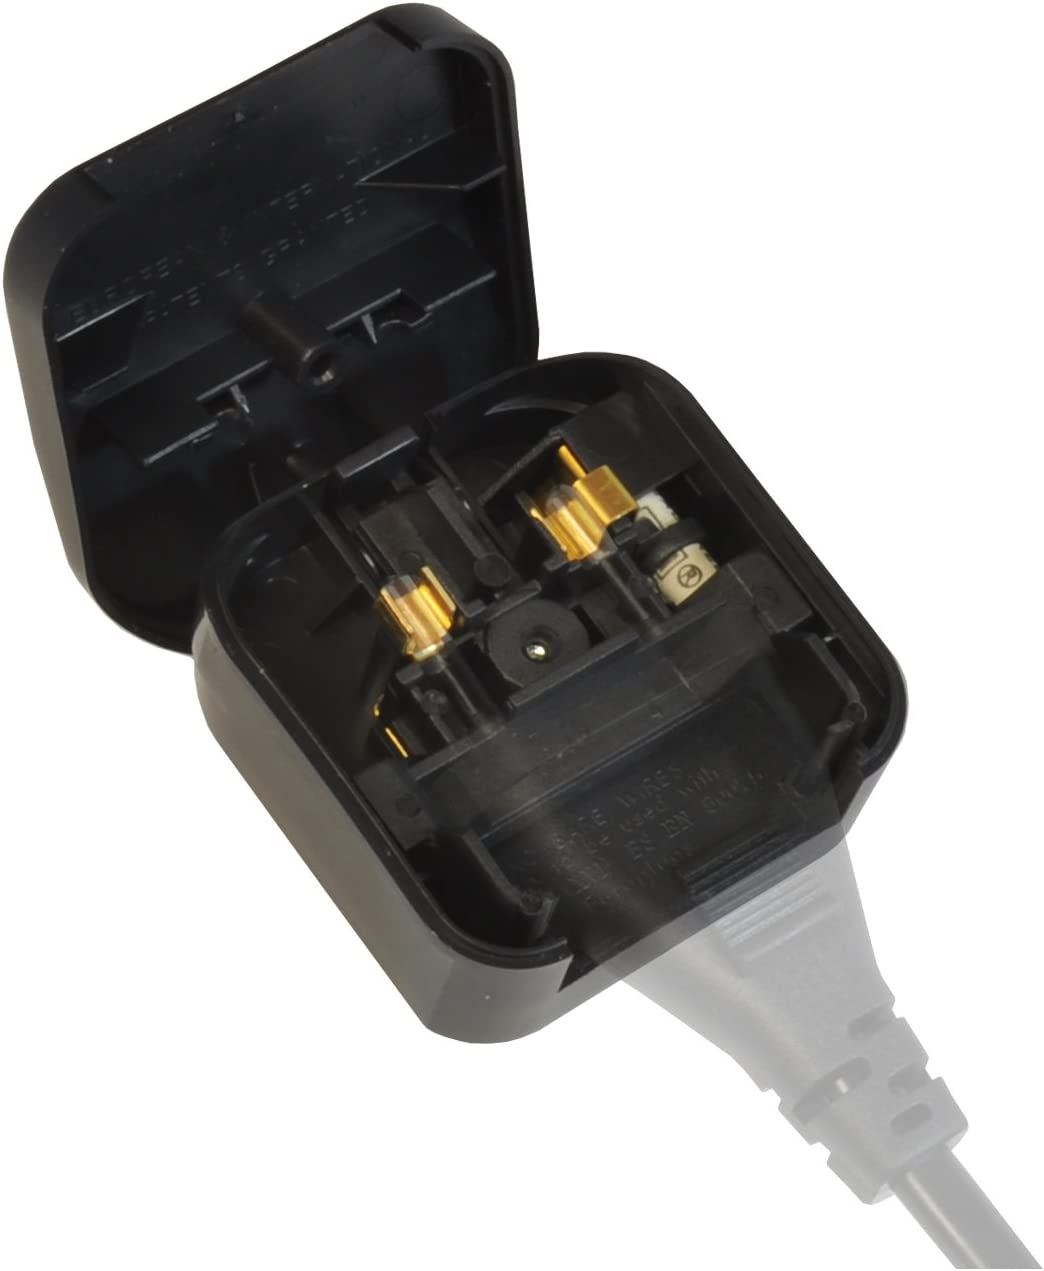 POWER PLUG EU Standard AC POWER CABLE CORD Plug Connector for HIFI AUDIO DIY x1